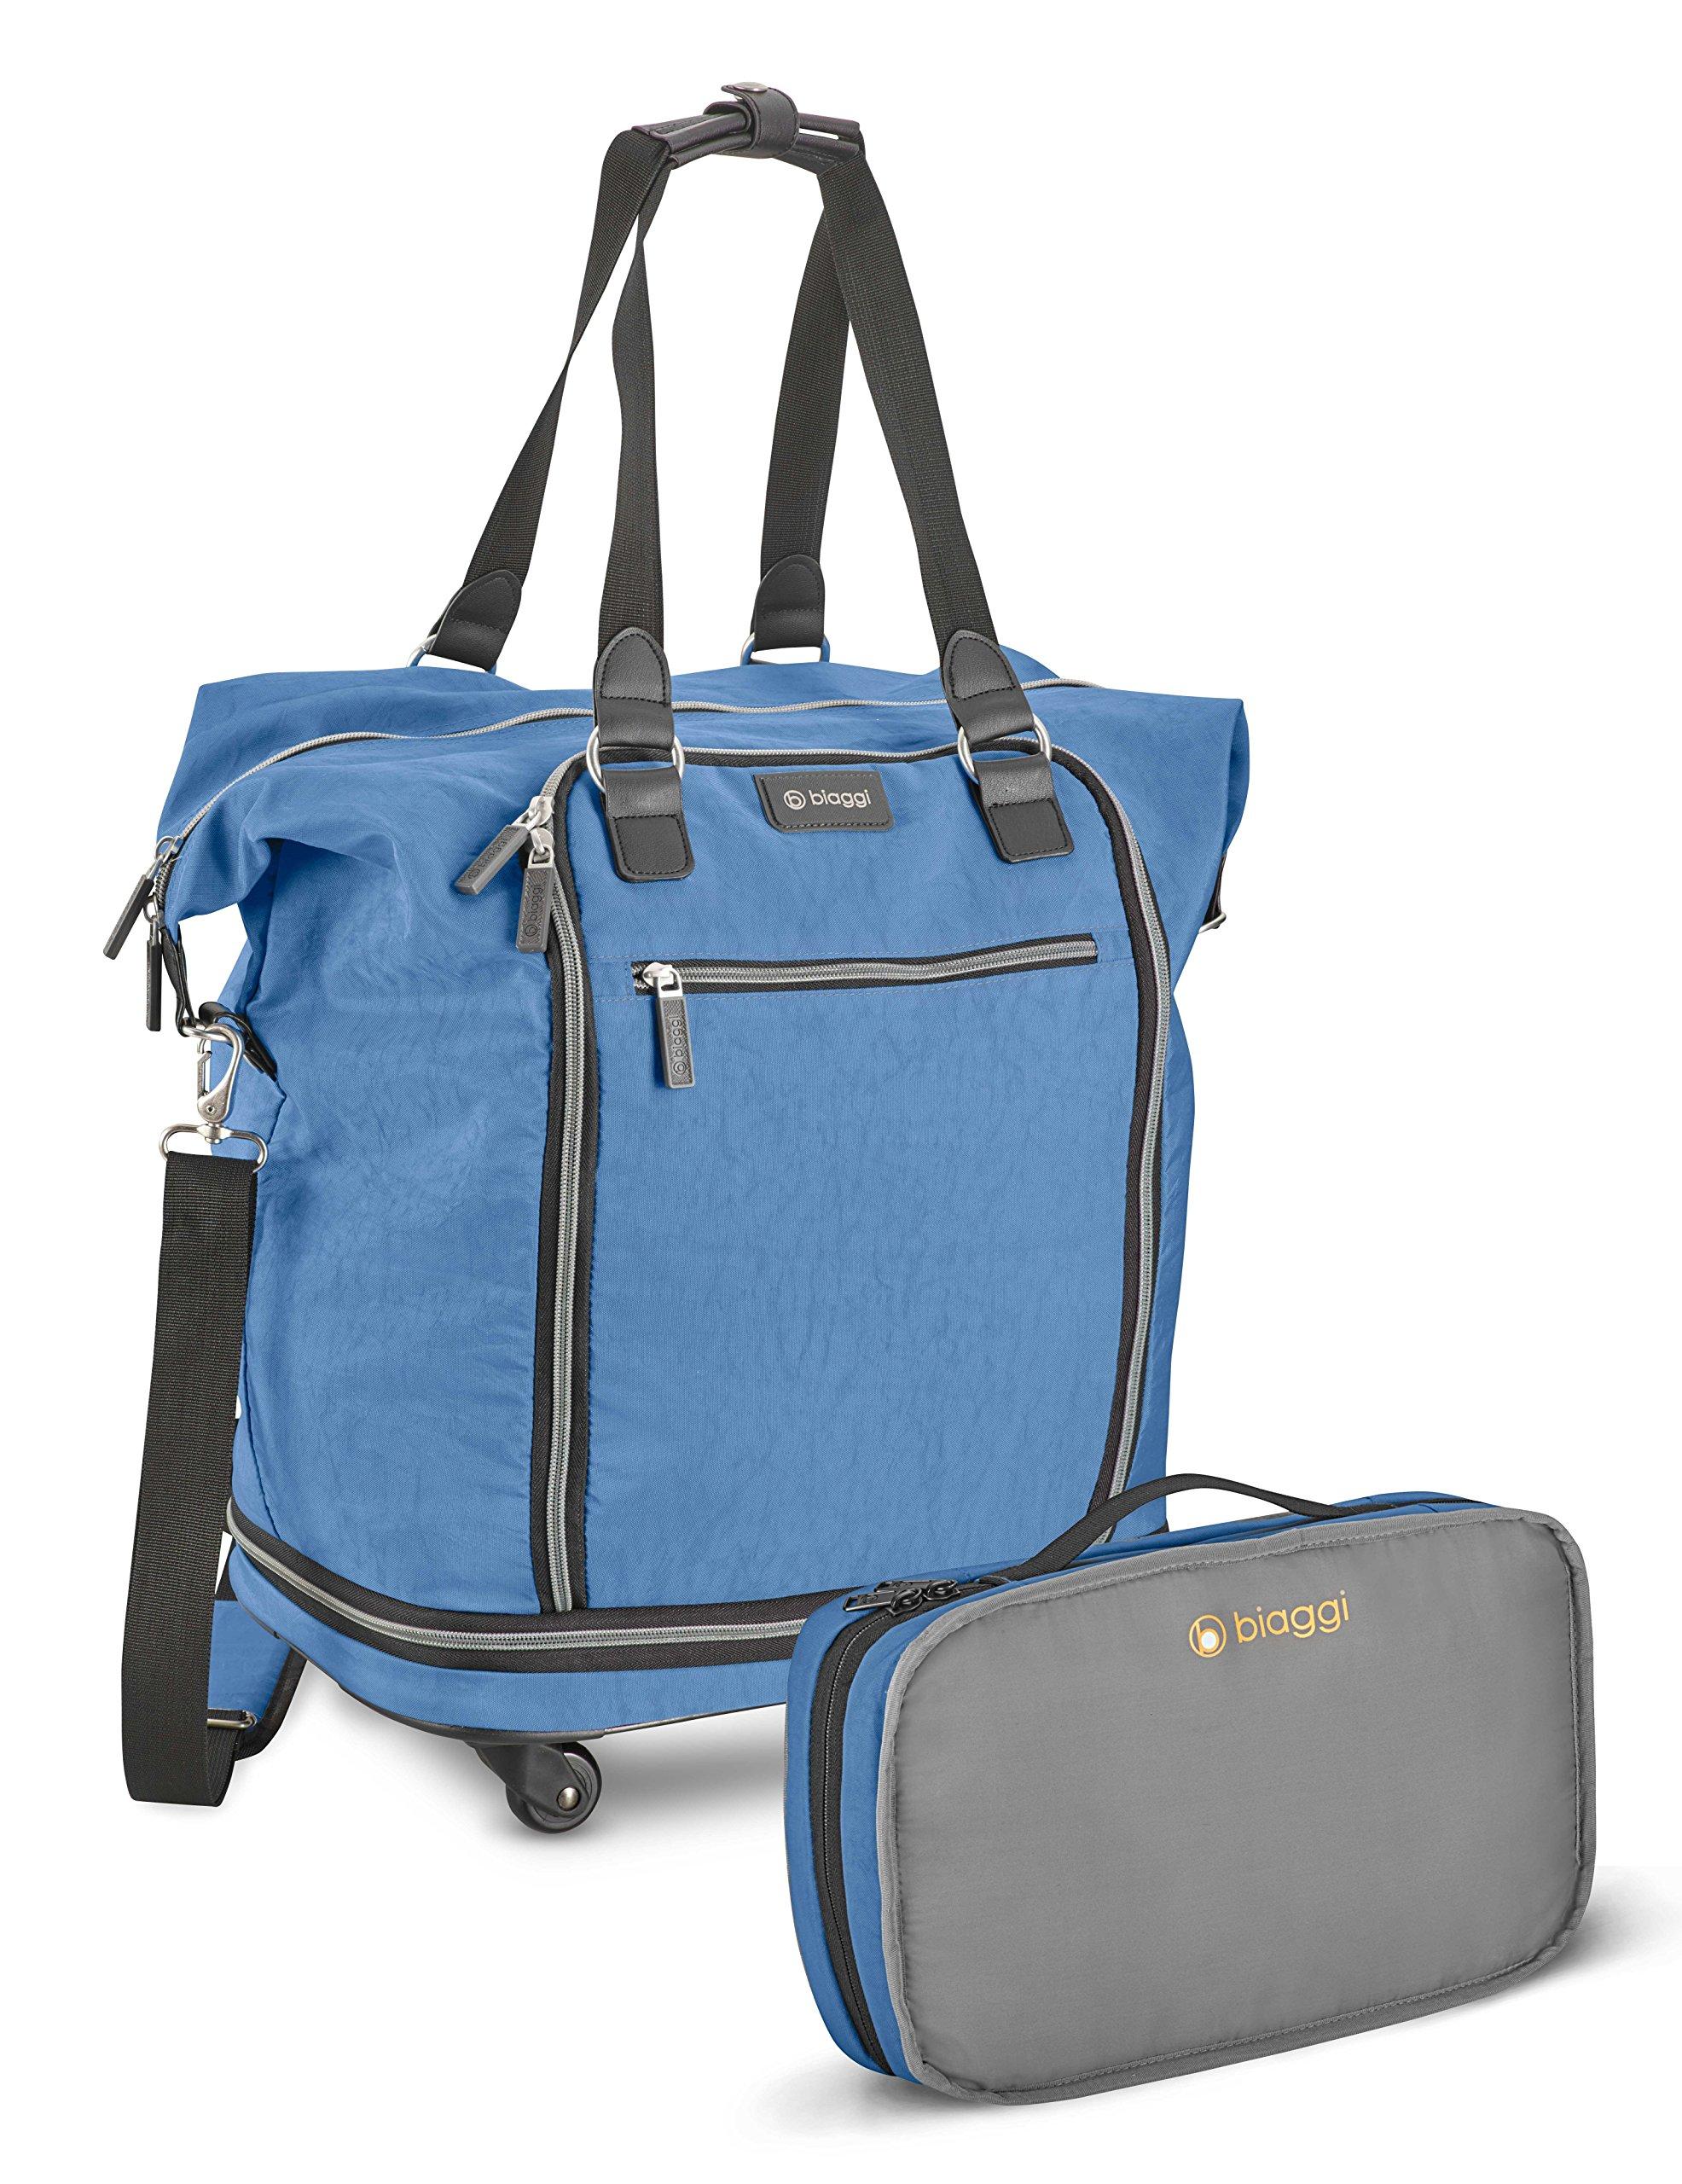 Biaggi Zipsak Micro Fold Spinner Fashion Tote - 20-Inch Luggage - As Seen on Shark Tank - Winter Blue